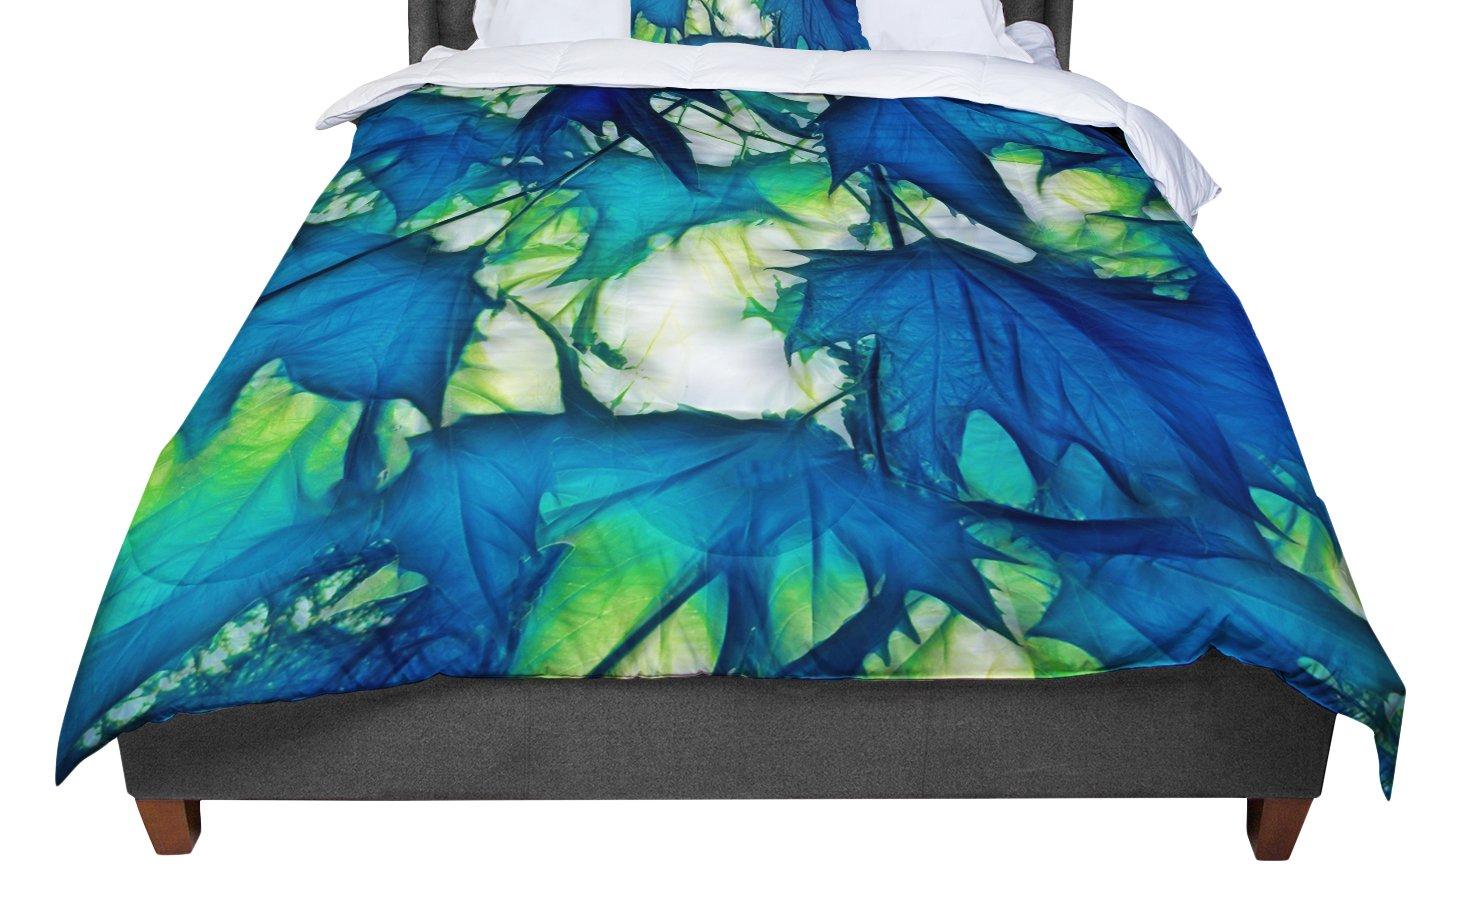 KESS InHouse Alison Coxon Leaves Twin Comforter 68 X 88